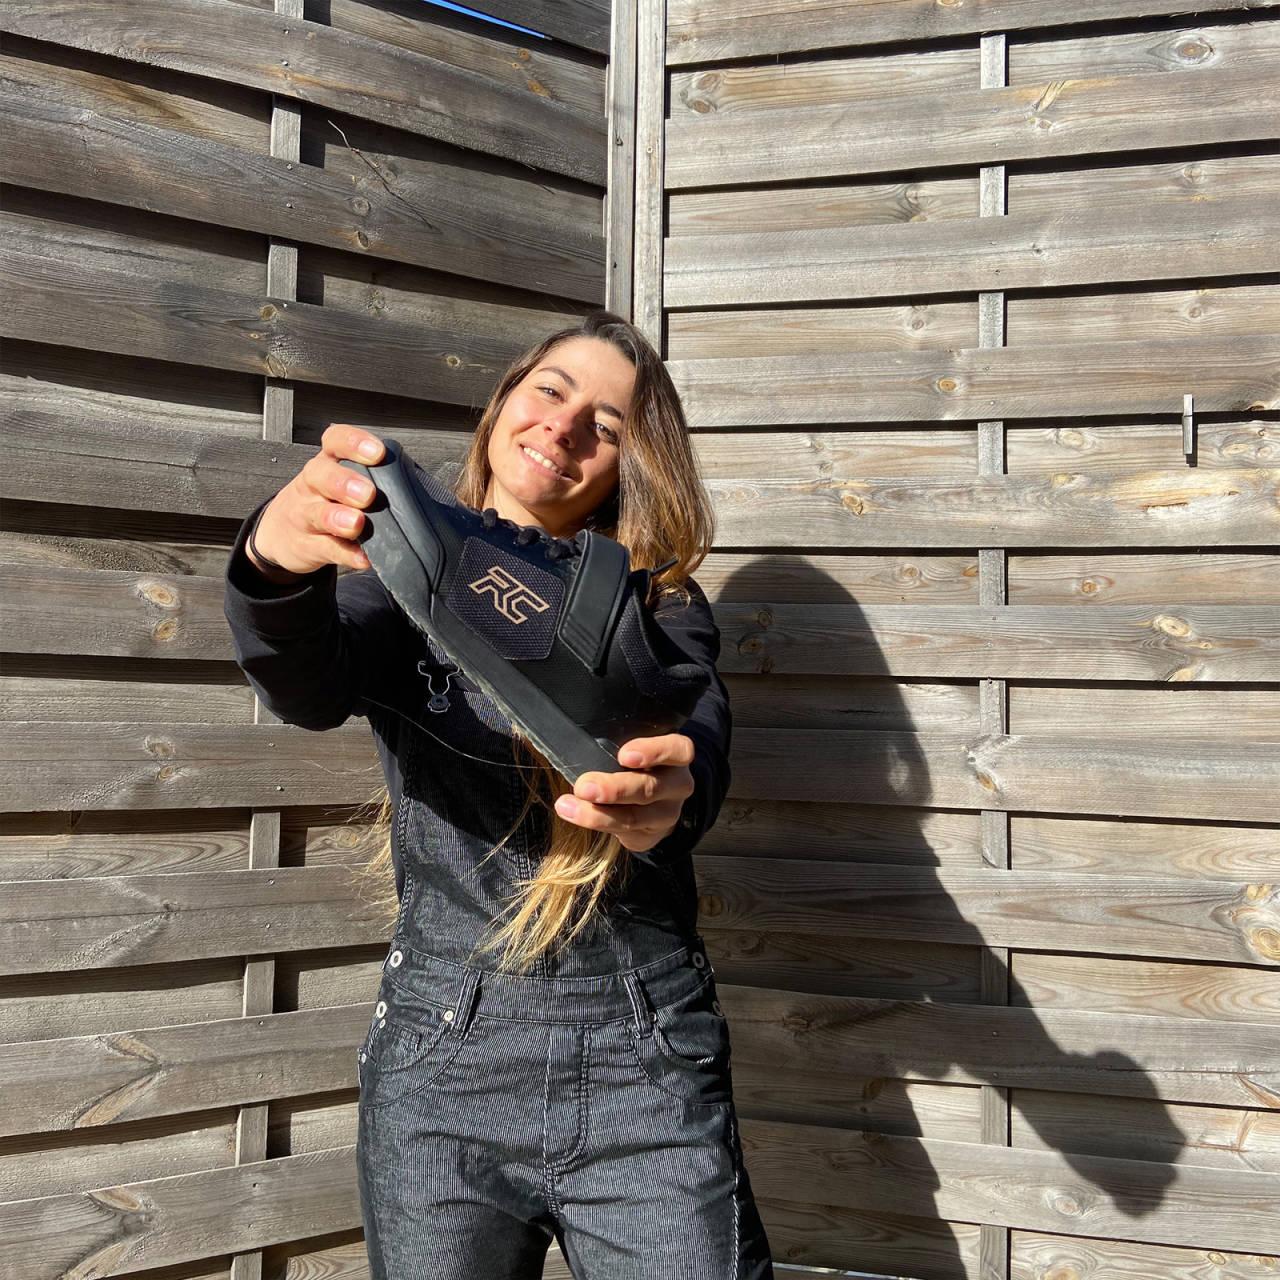 VERDENSMESTER: Fjorårets EWS-vinner Isabeau Cordurier fronter Ride Concepts satsing på enduro i 2020.